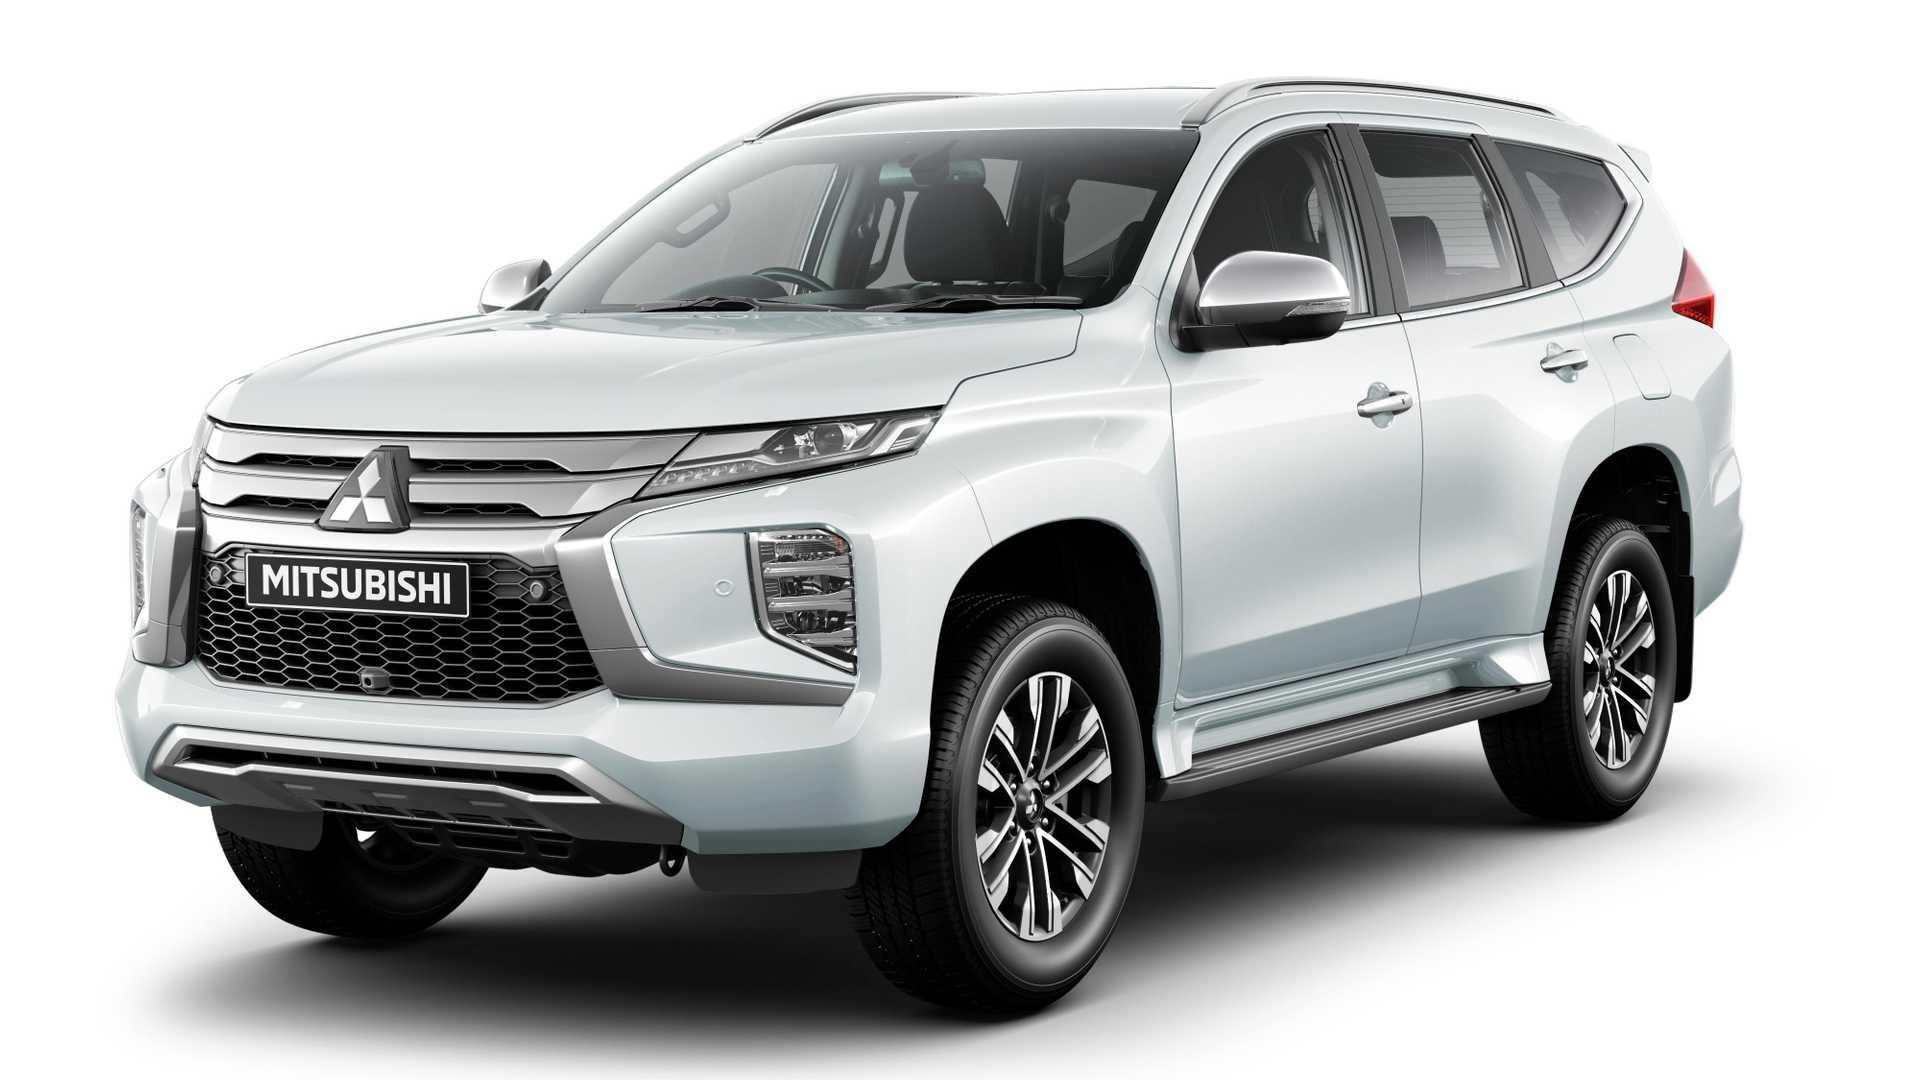 Mitsubishi Montero Sport Price In Kuwait New Mitsubishi Montero Sport Photos And Specs Yallamotor